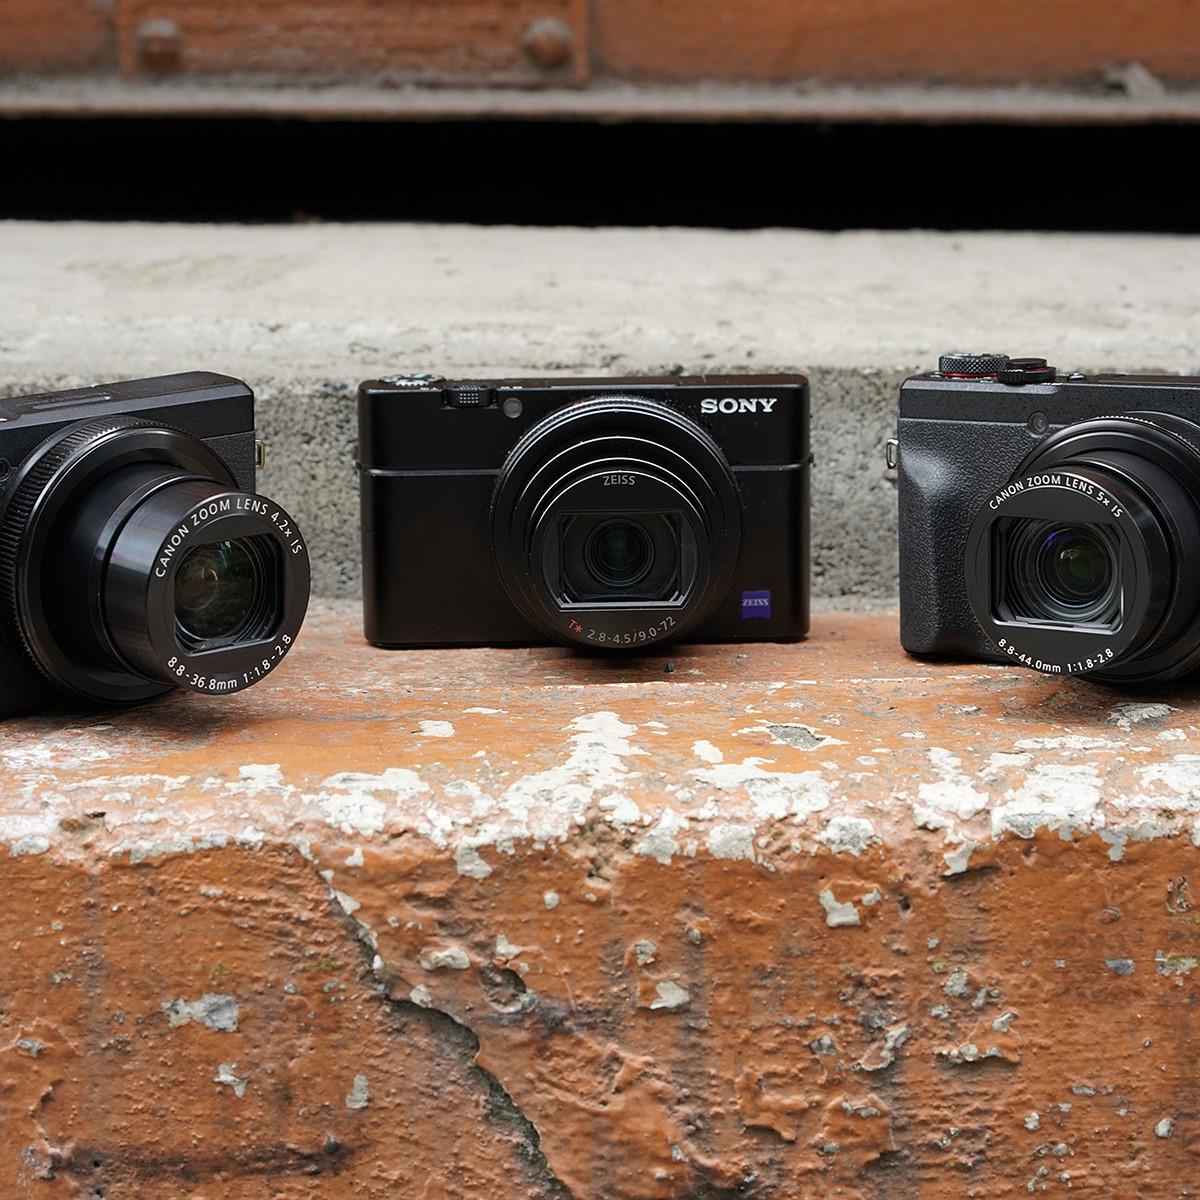 Top Compact Canon G5 X Ii Vs Sony Rx100 Vii Vs G7 X Iii